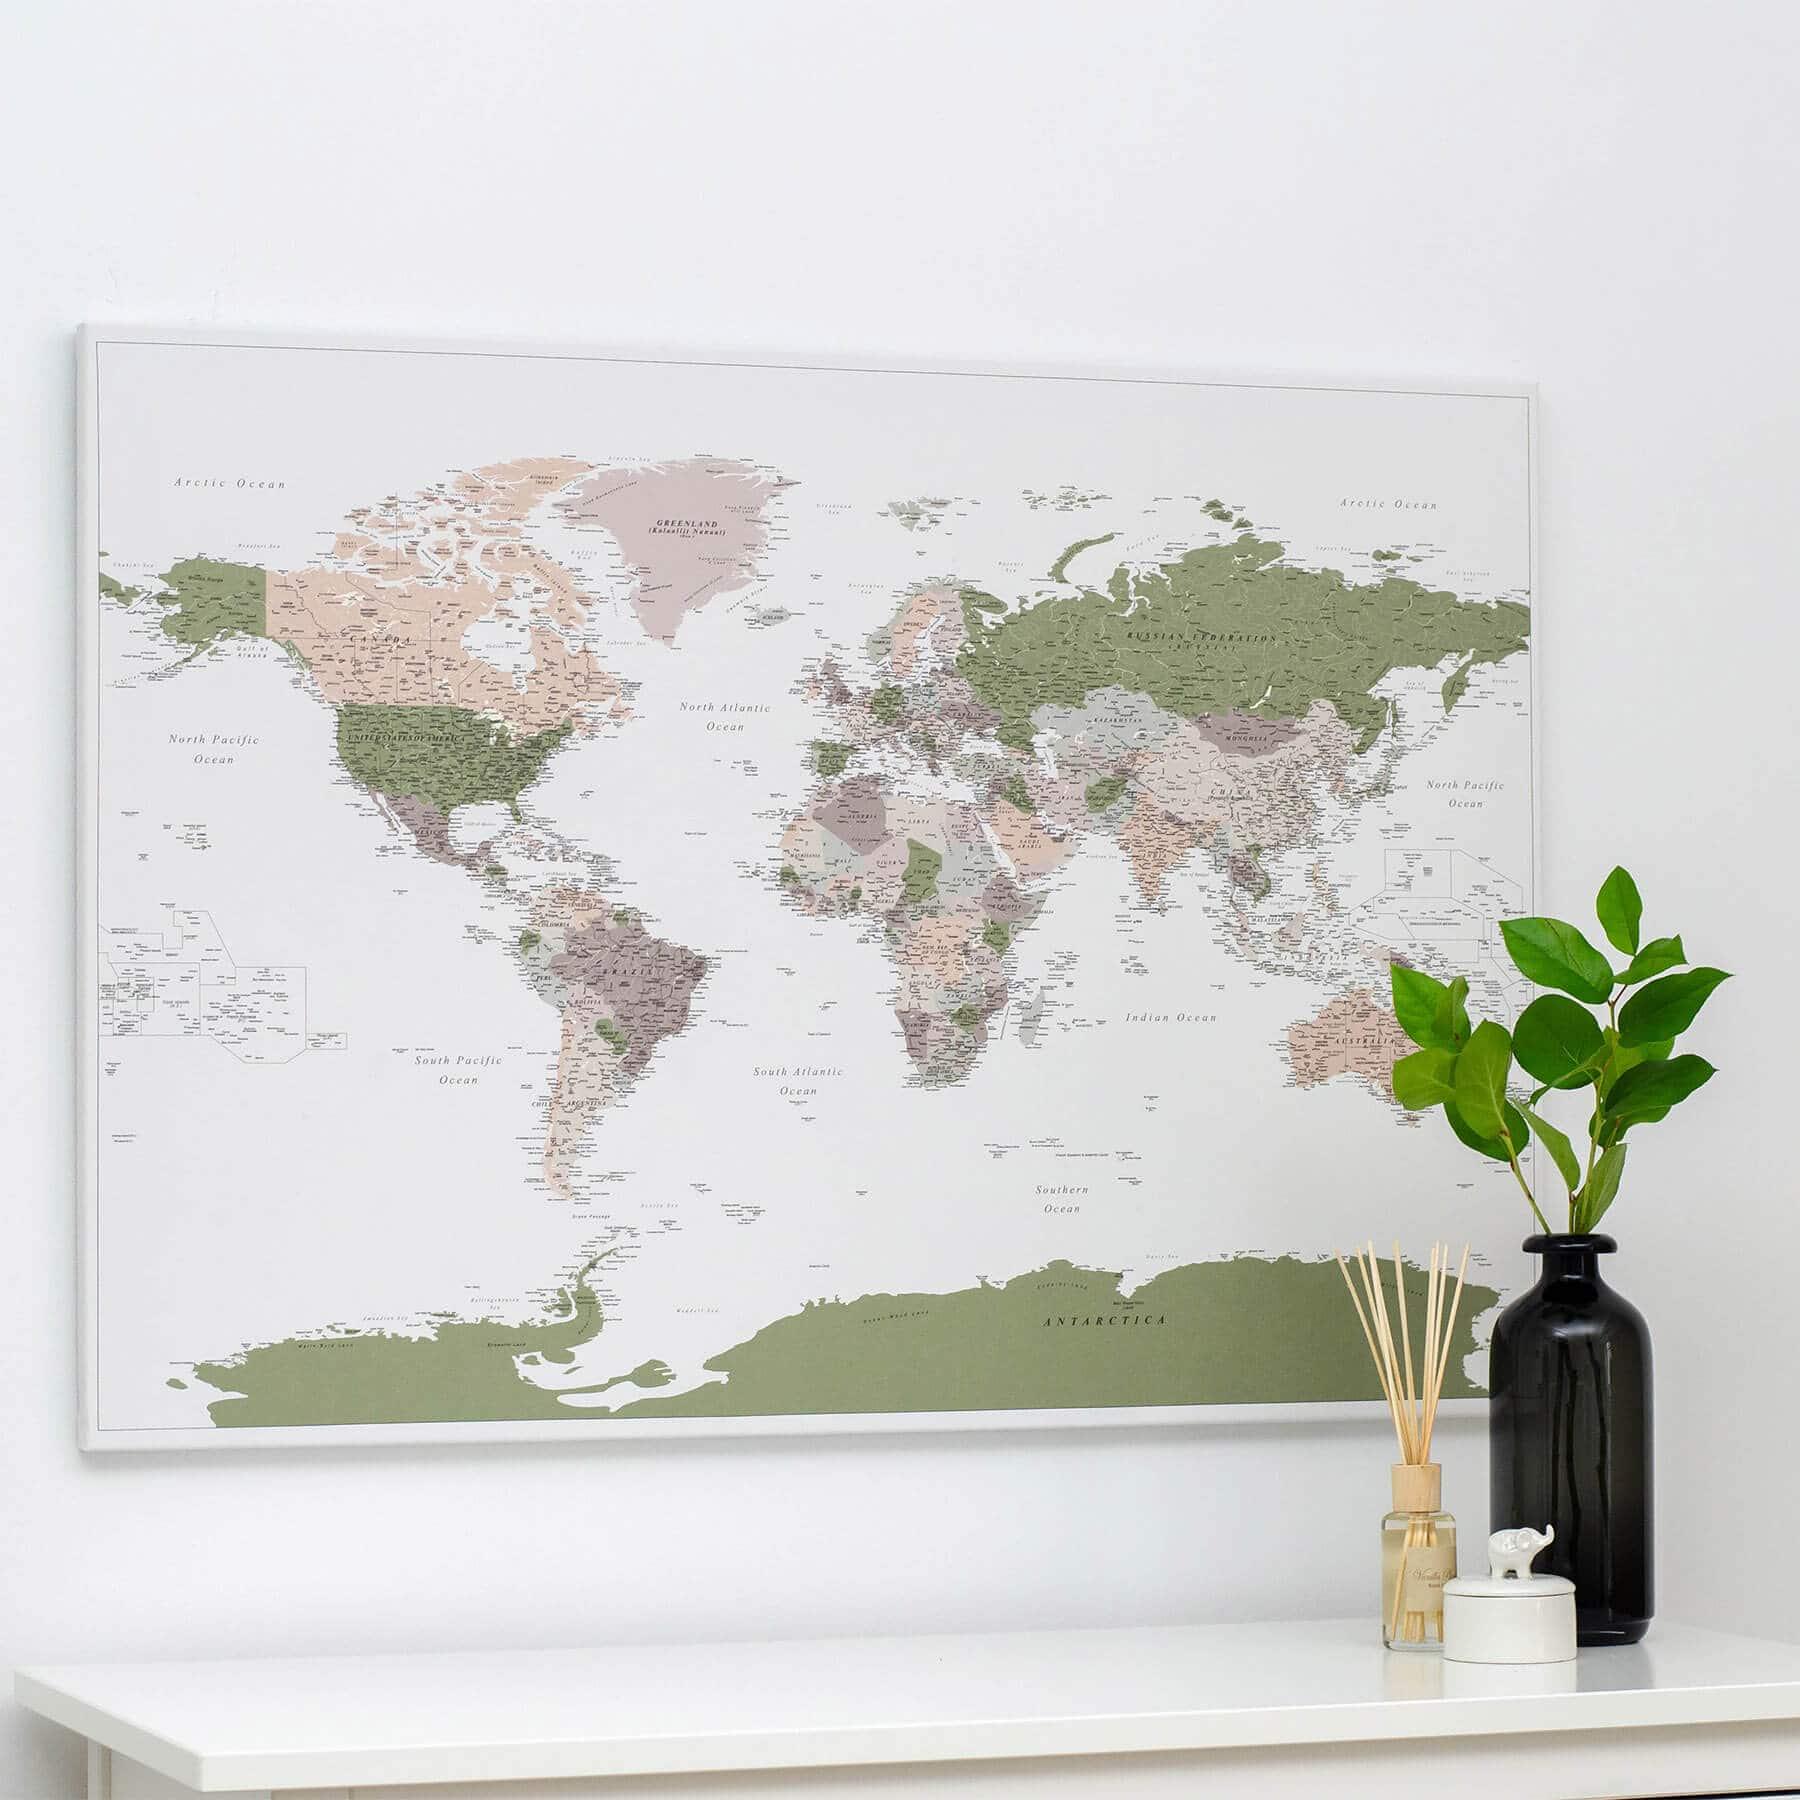 World Push Pin Map - Green / violet (Detailed) - Push Pin Travel Maps